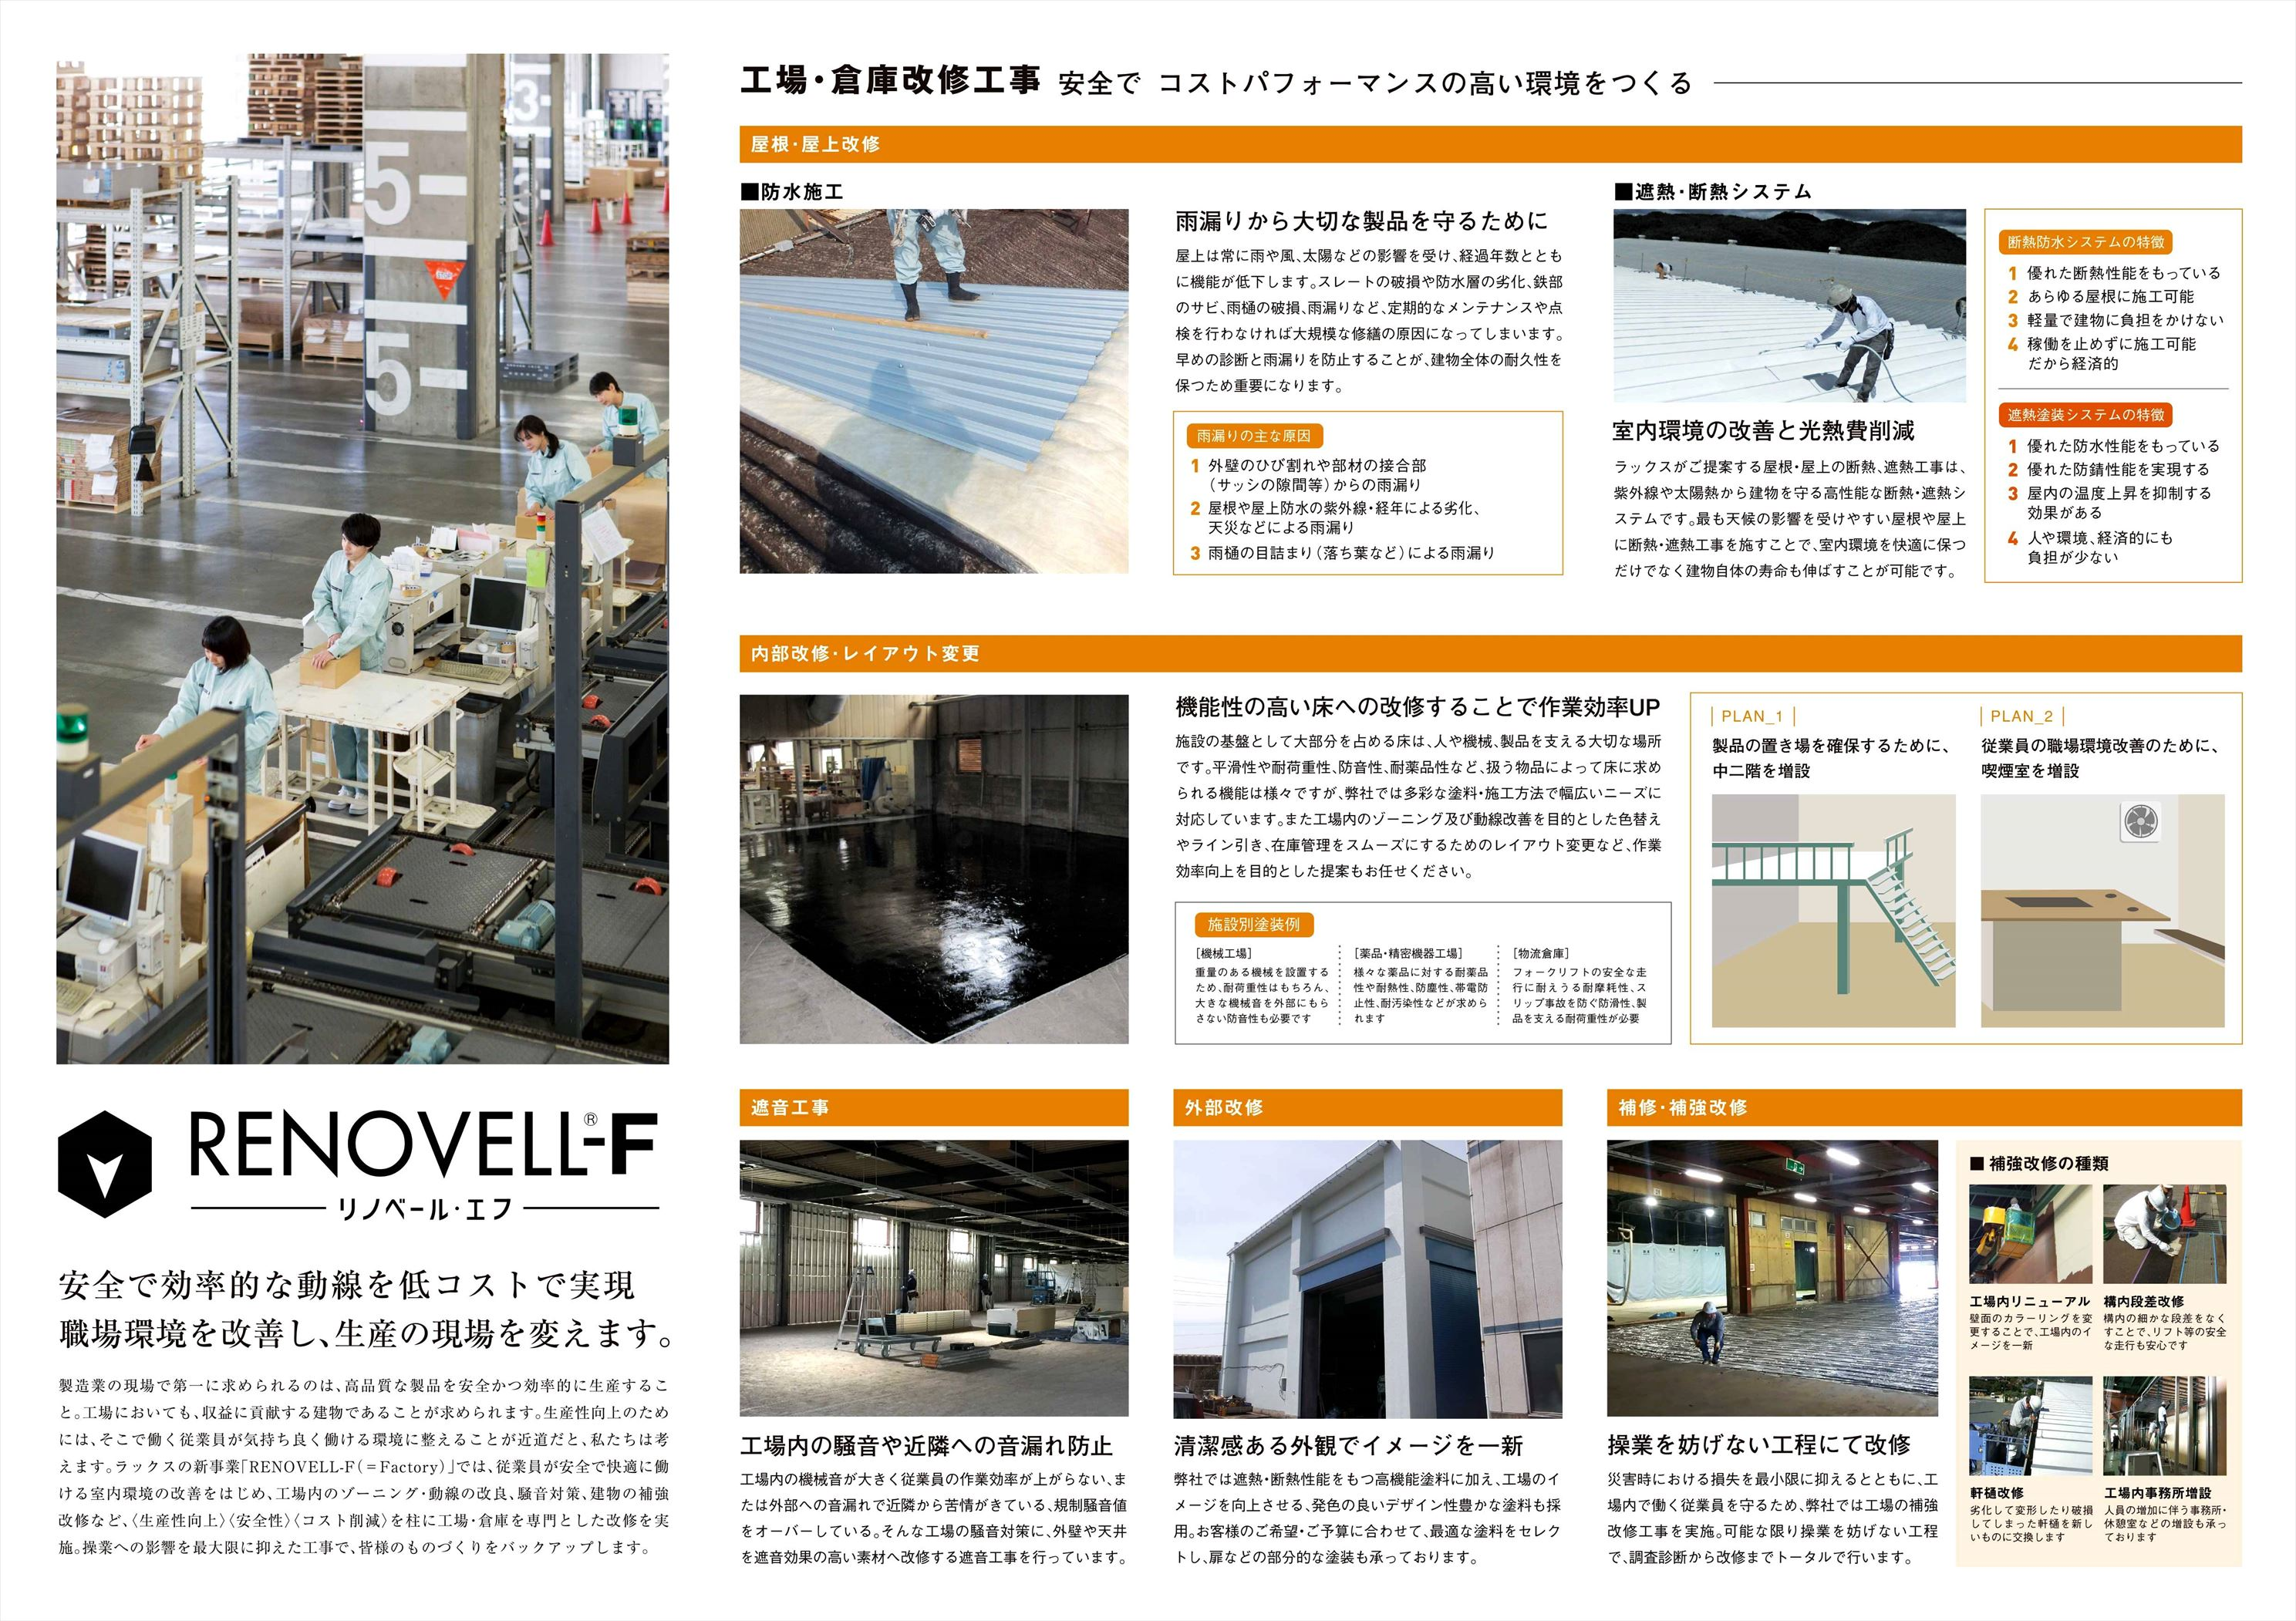 Renovell_F-180213-2_R.jpg